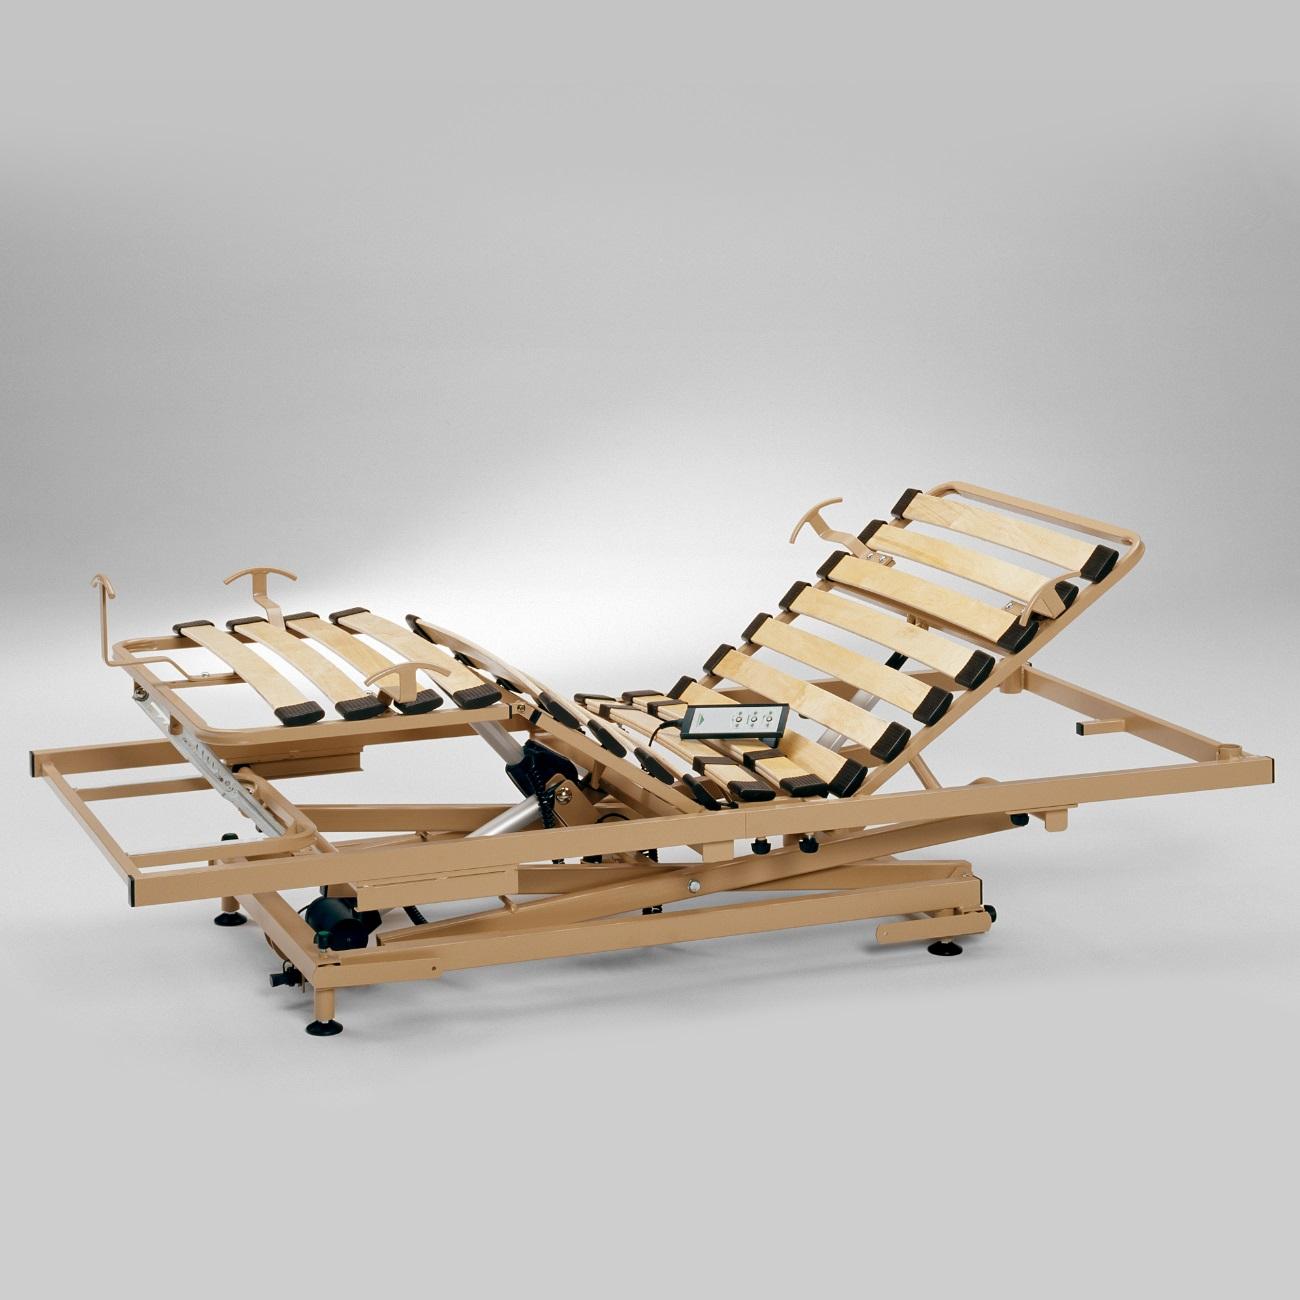 lattenrost h henverstellbar f r senioren u pflegebett online sanit tshaus. Black Bedroom Furniture Sets. Home Design Ideas